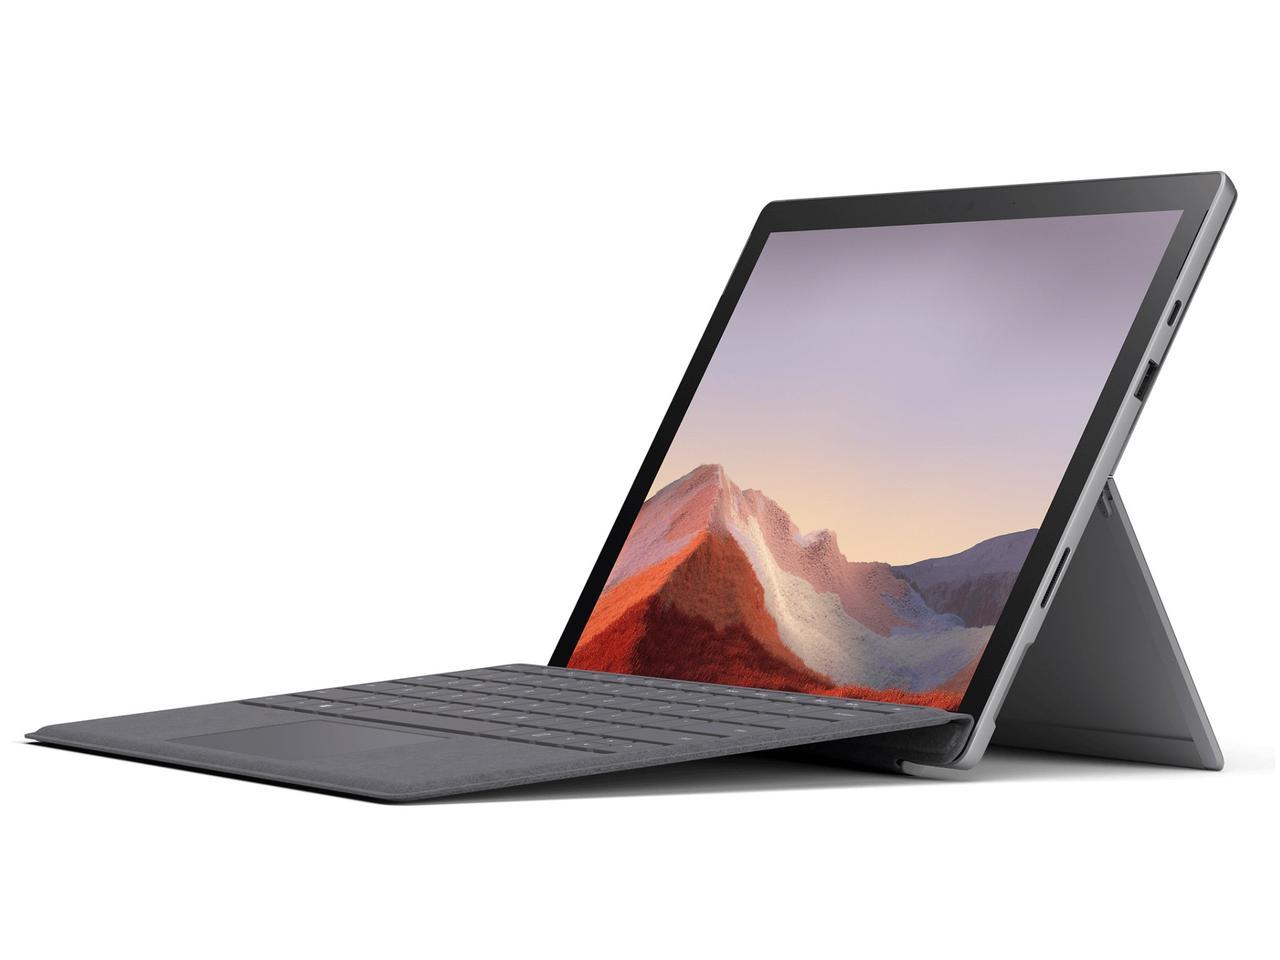 Surface Pro 7 Platinum, Intel Core i3, 4GB, 128GB